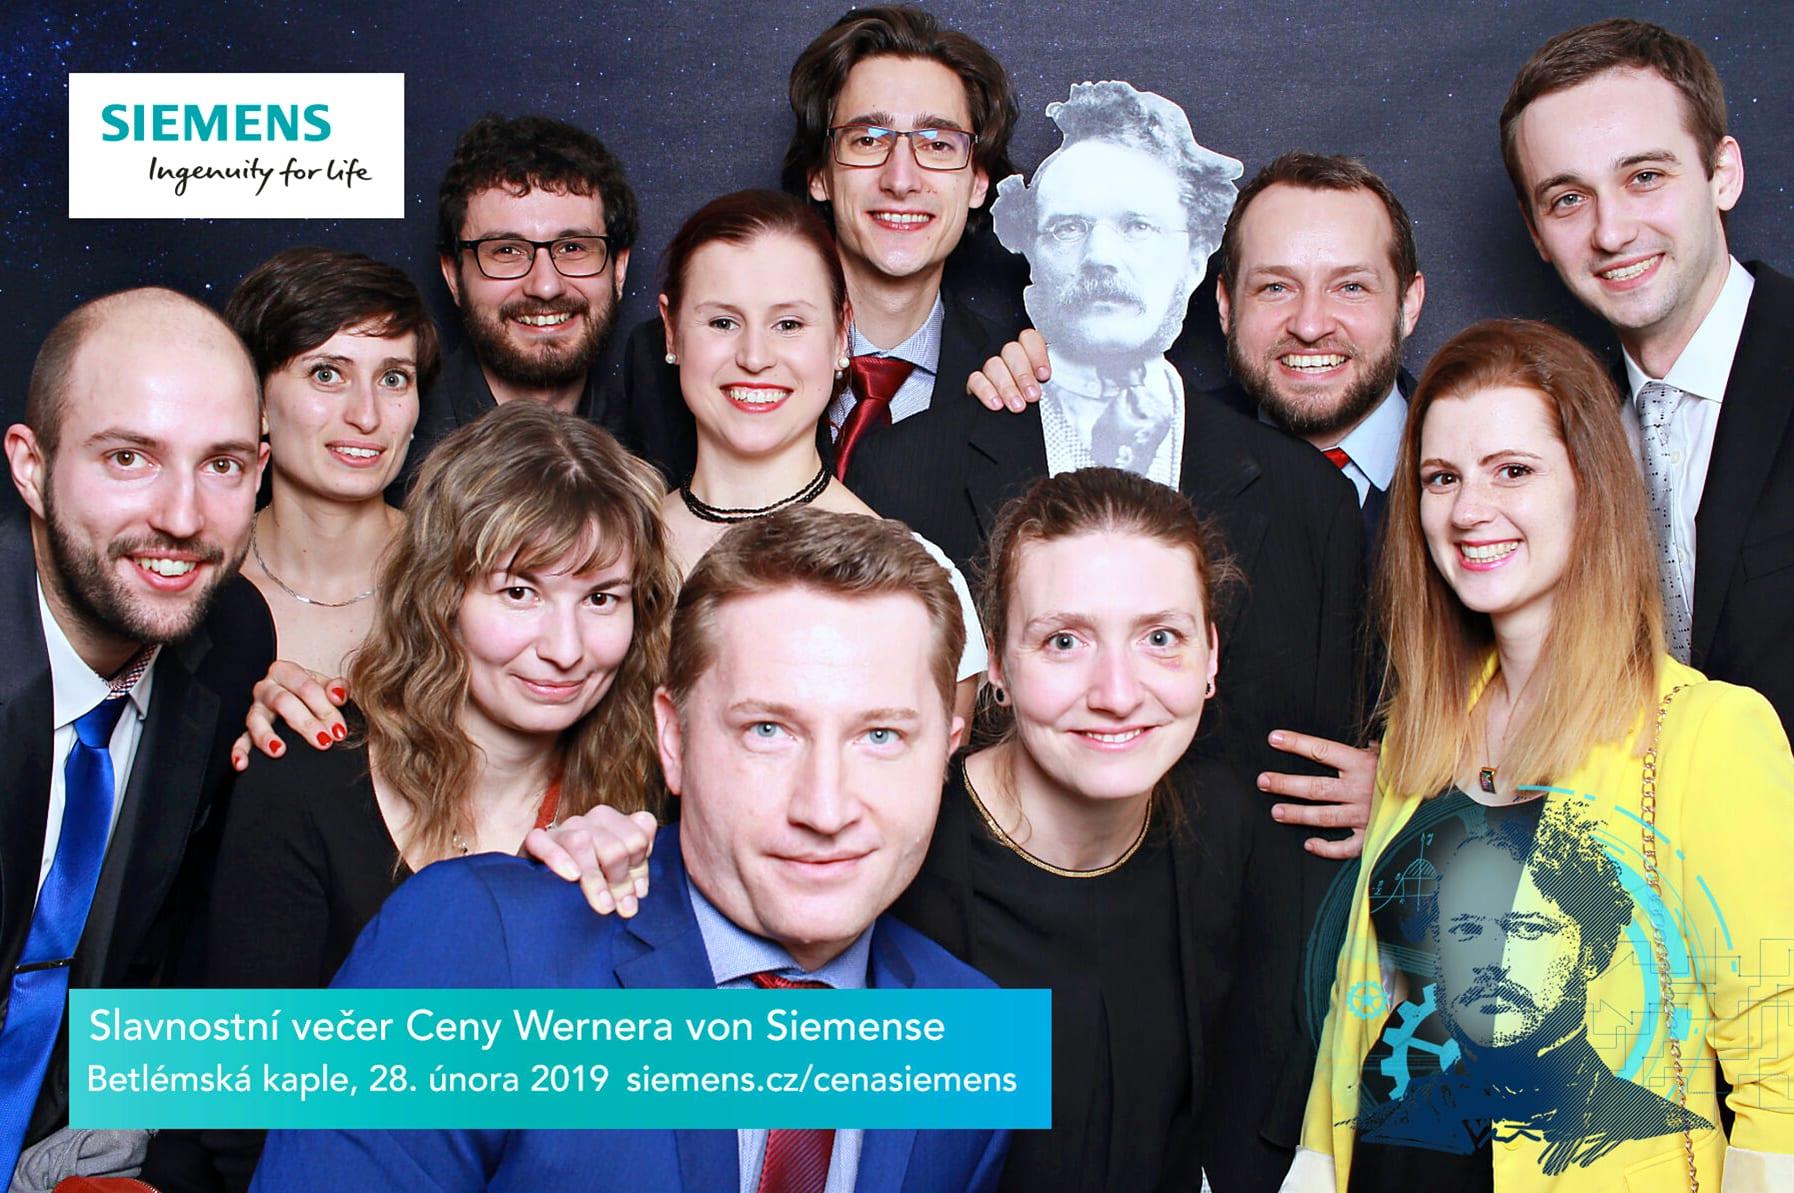 fotokoutek-slavnostni-vecer-ceny-warnera-von-siemense-28-2-2019-585696